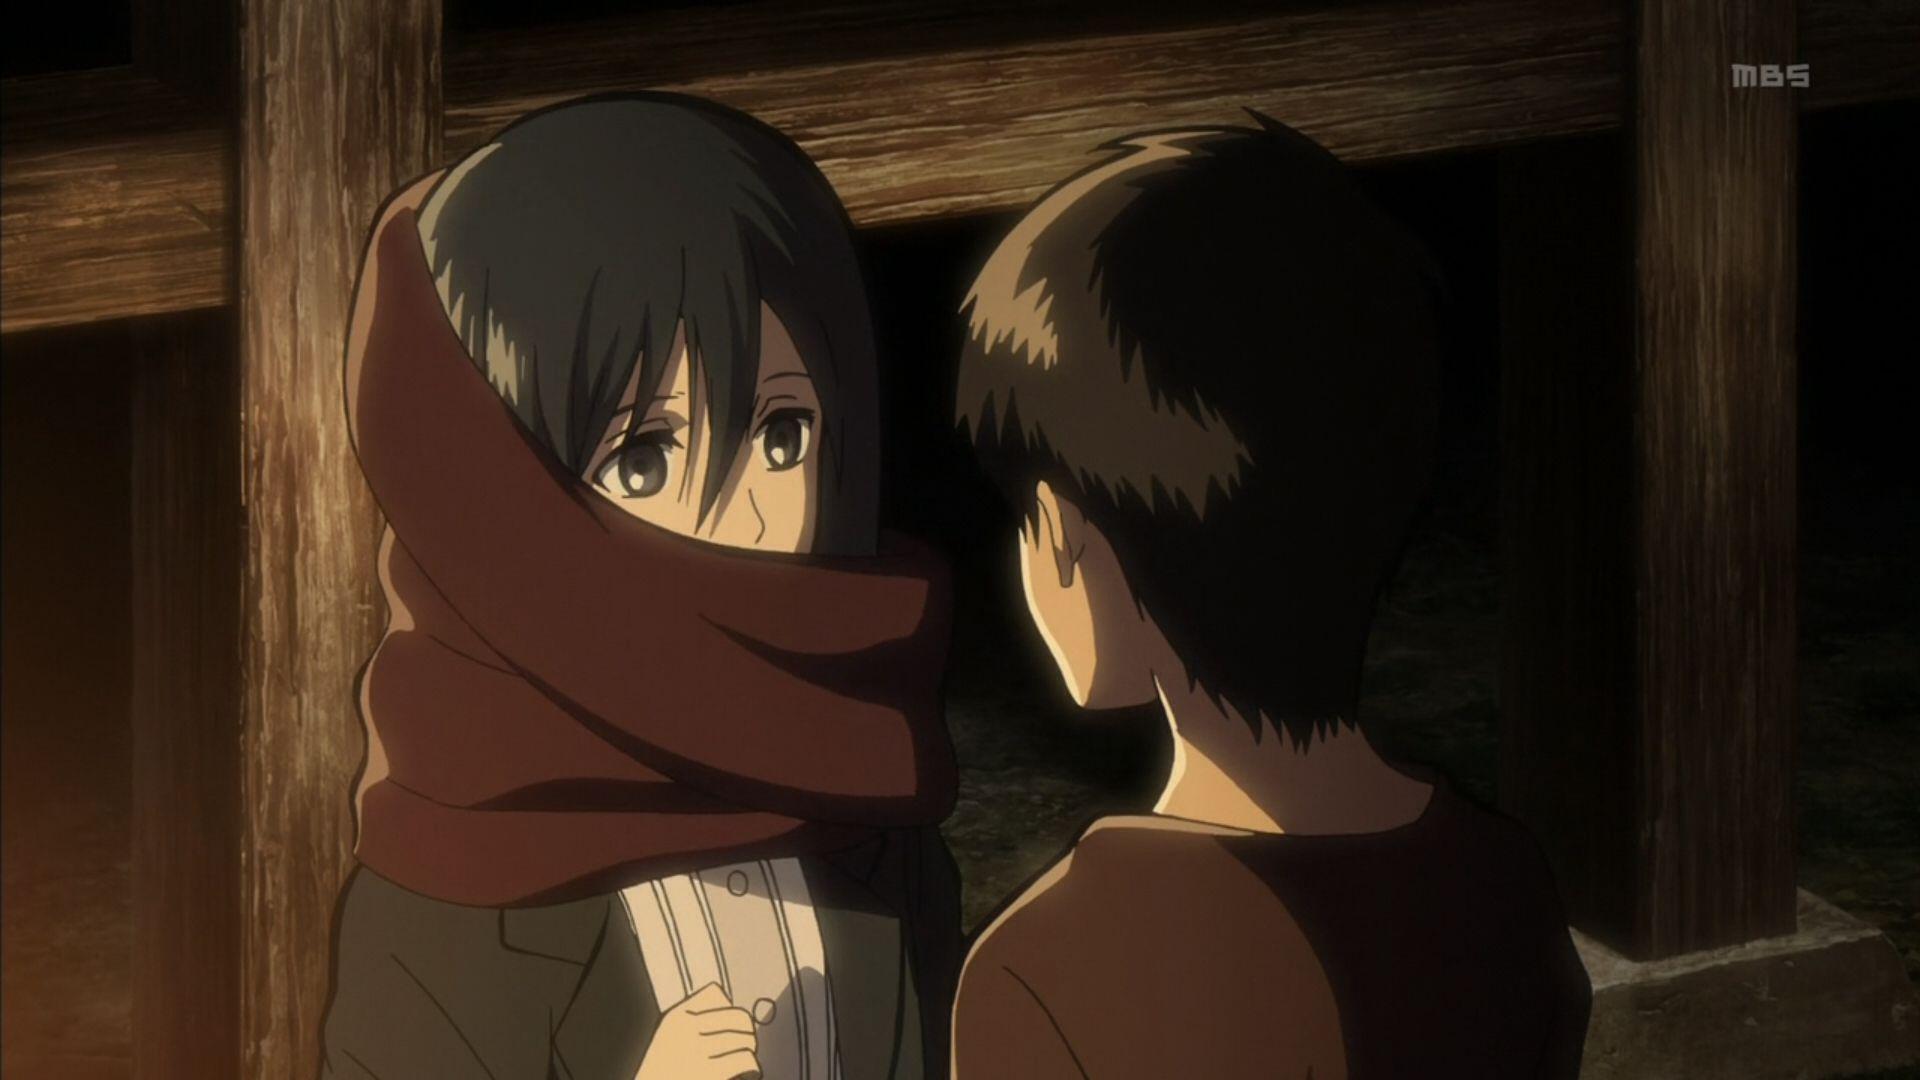 Eren and Mikasa. Oh my gosh I love this anime.